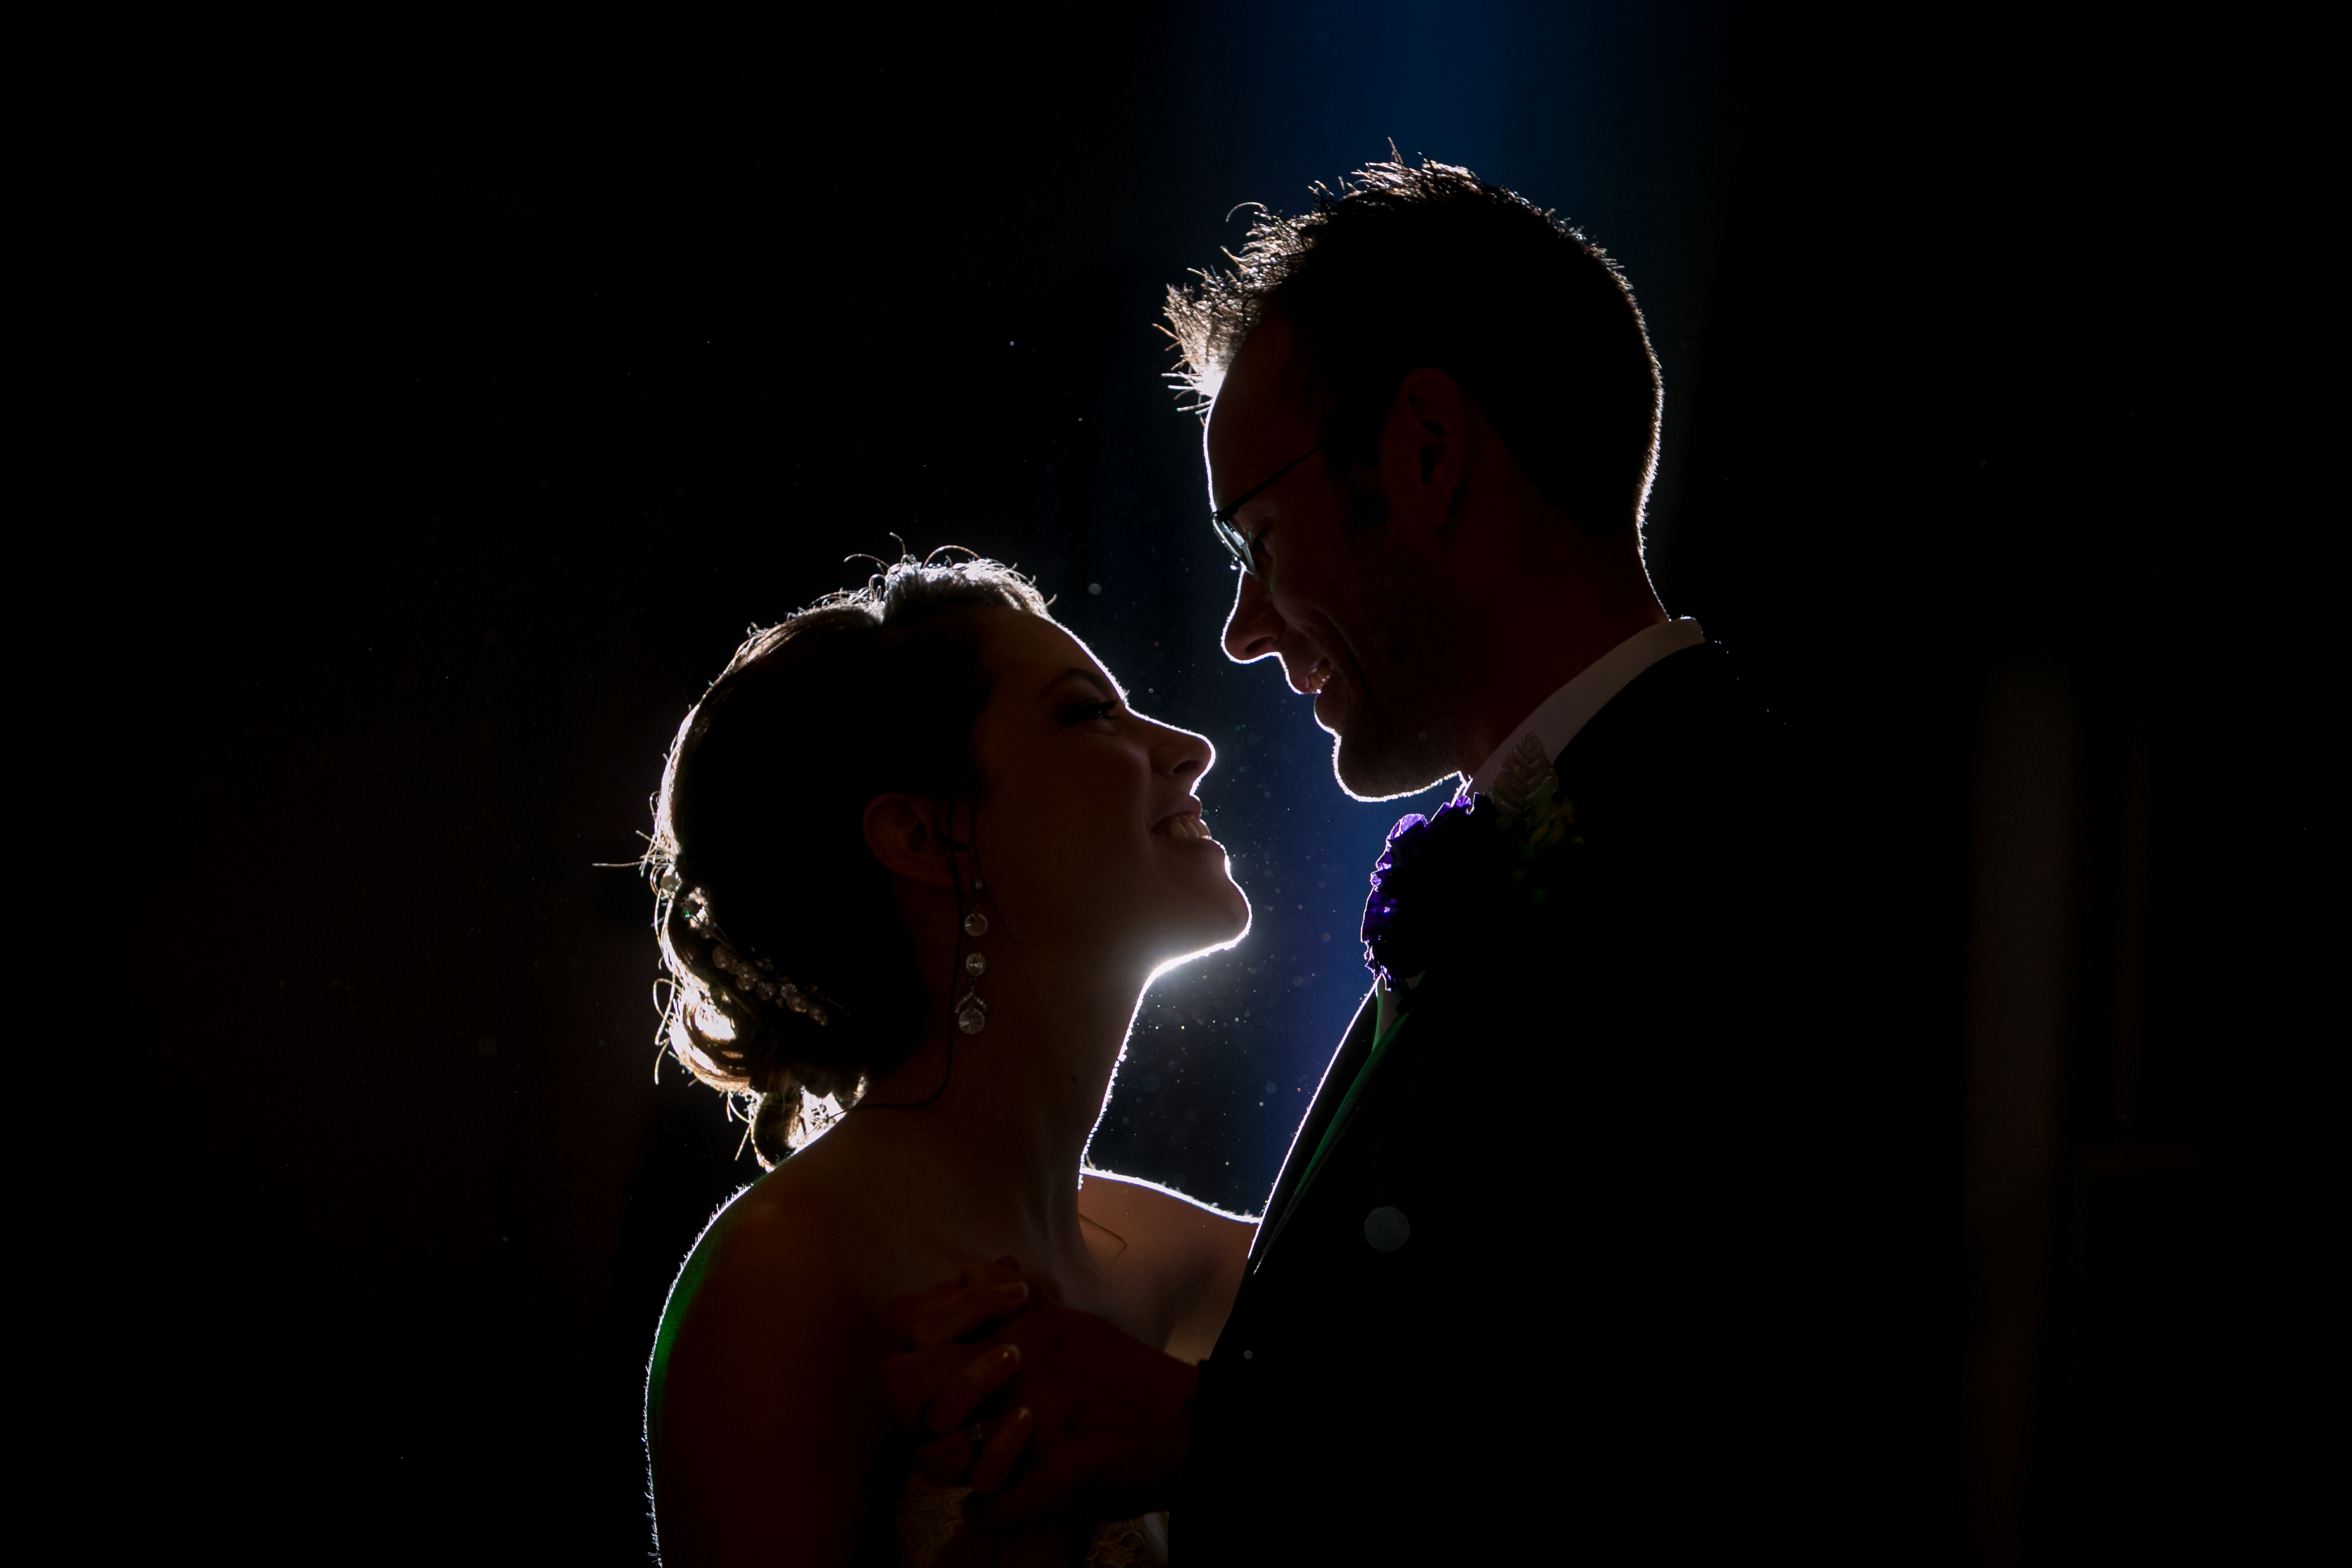 Wedding Portrait: First Dance Silhouette